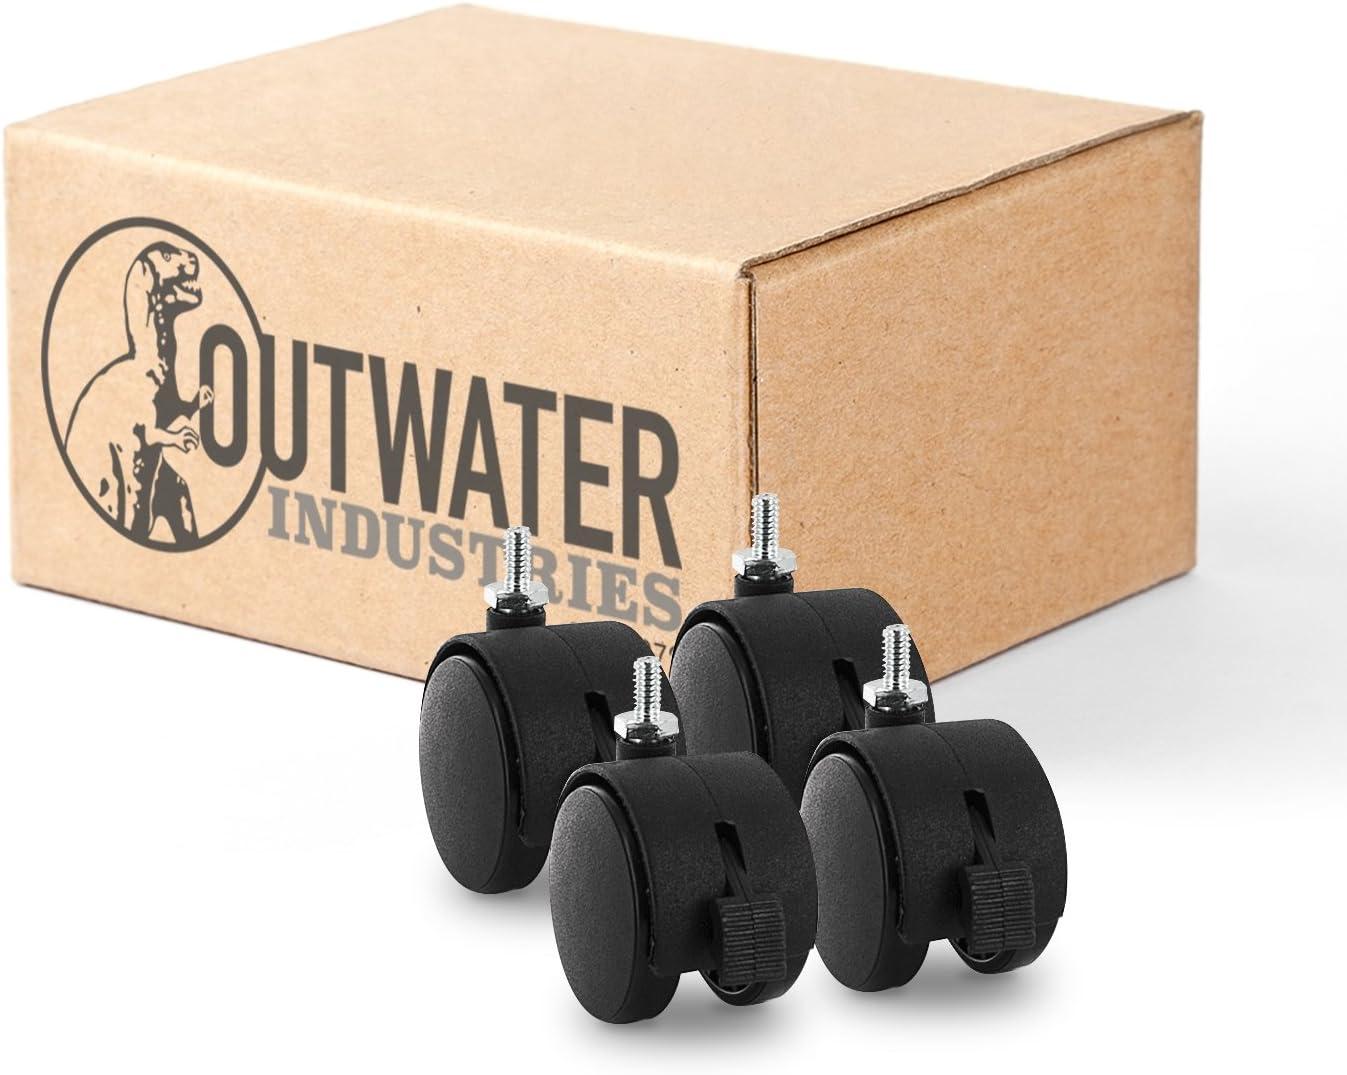 "2"" Wheel Diameter | Black Nylon Swivel Hooded Samson Twin Wheel Caster with Brake | and 1/4-20 x 1/2"" Threaded Stem | Swivel Radius of 2-1/8"" | 4 Pack by Outwater"